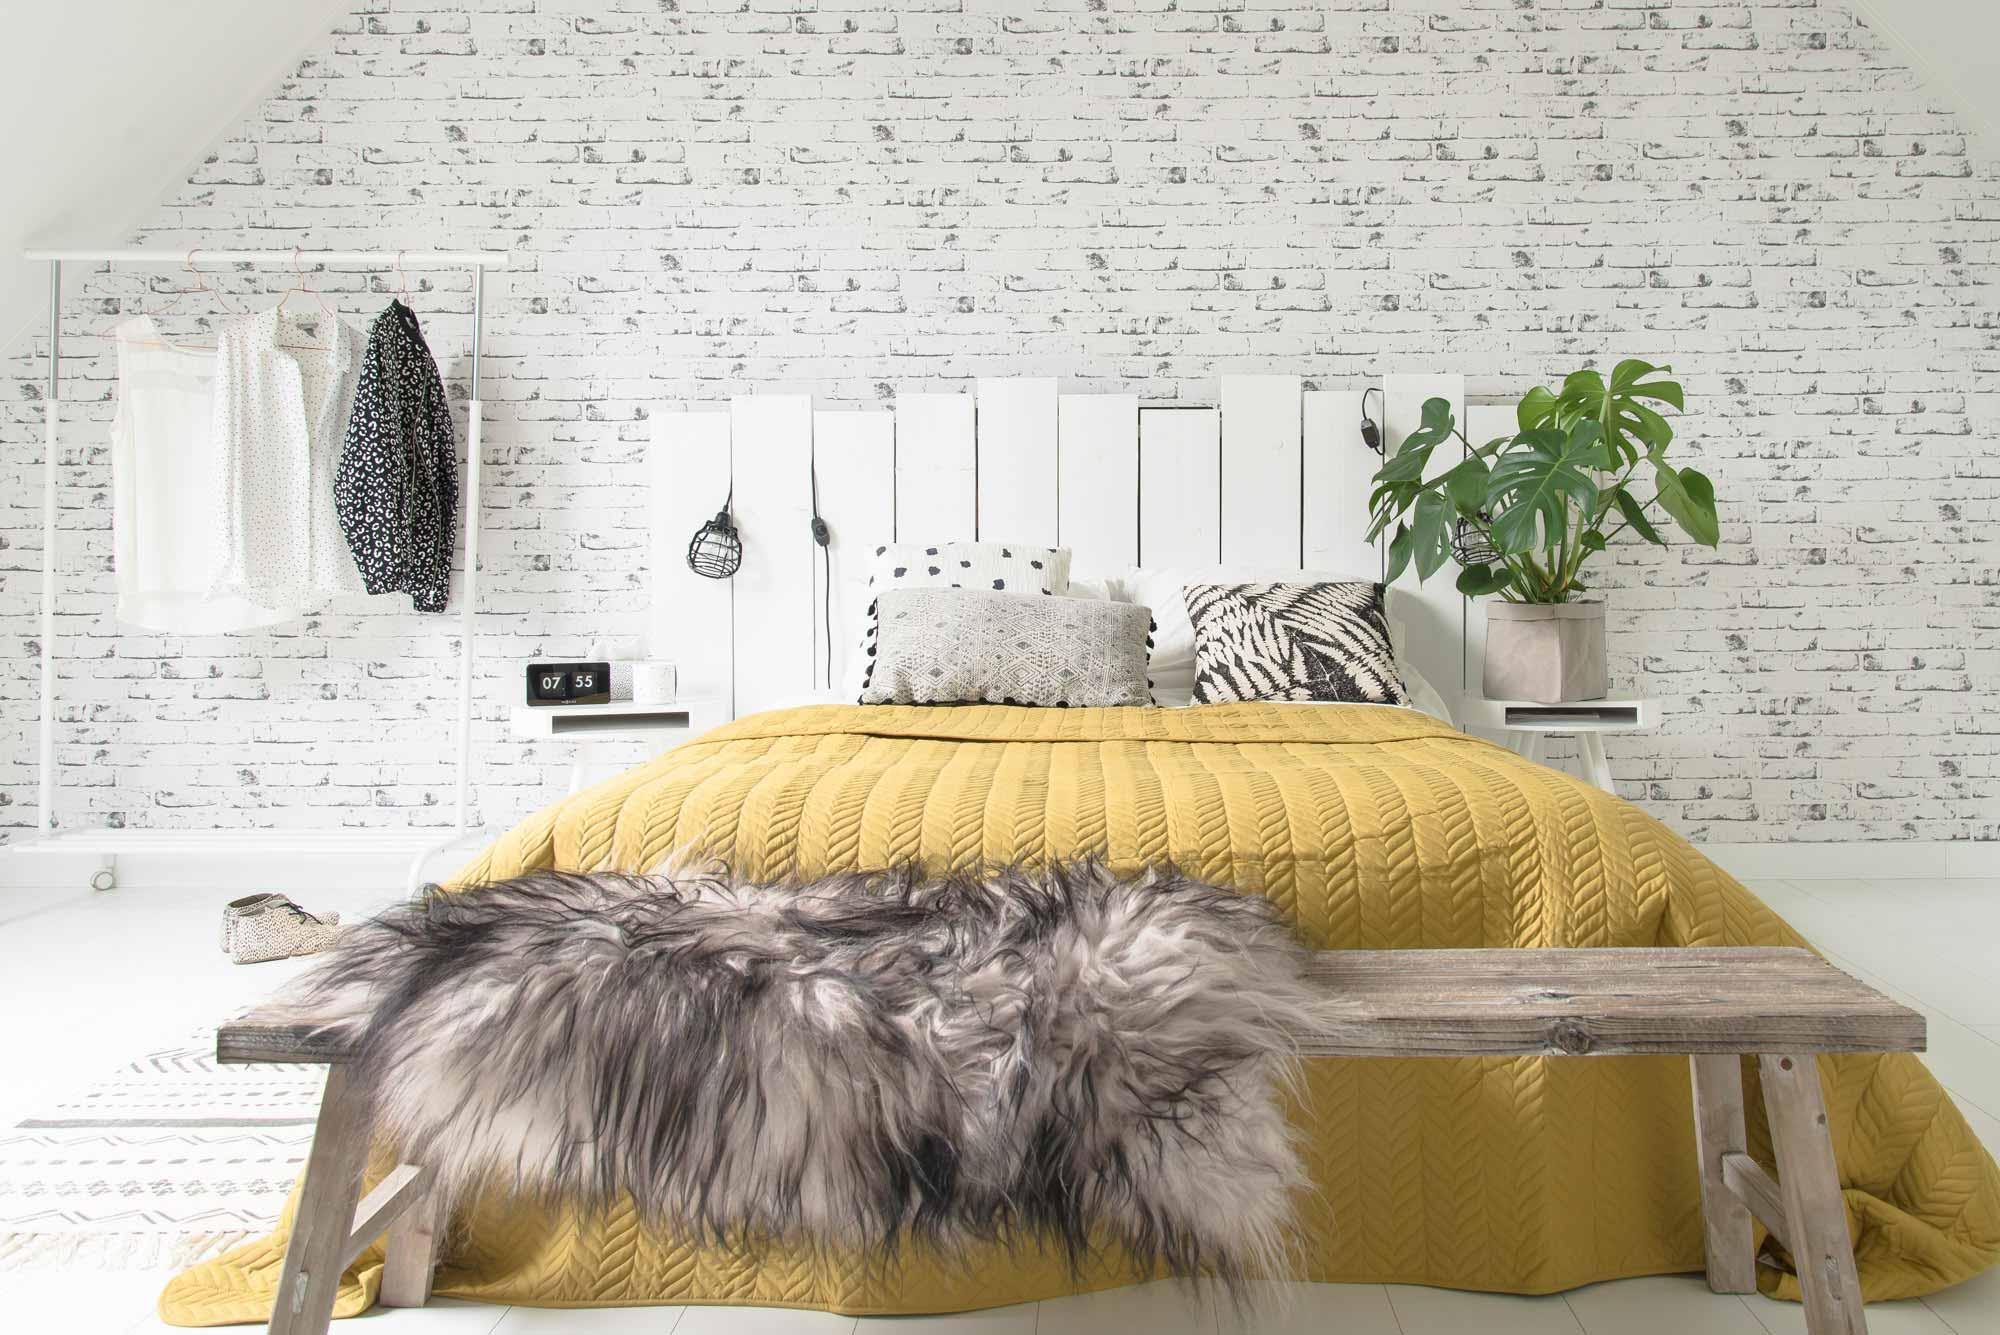 slaapkamer remade voorjaarshuis